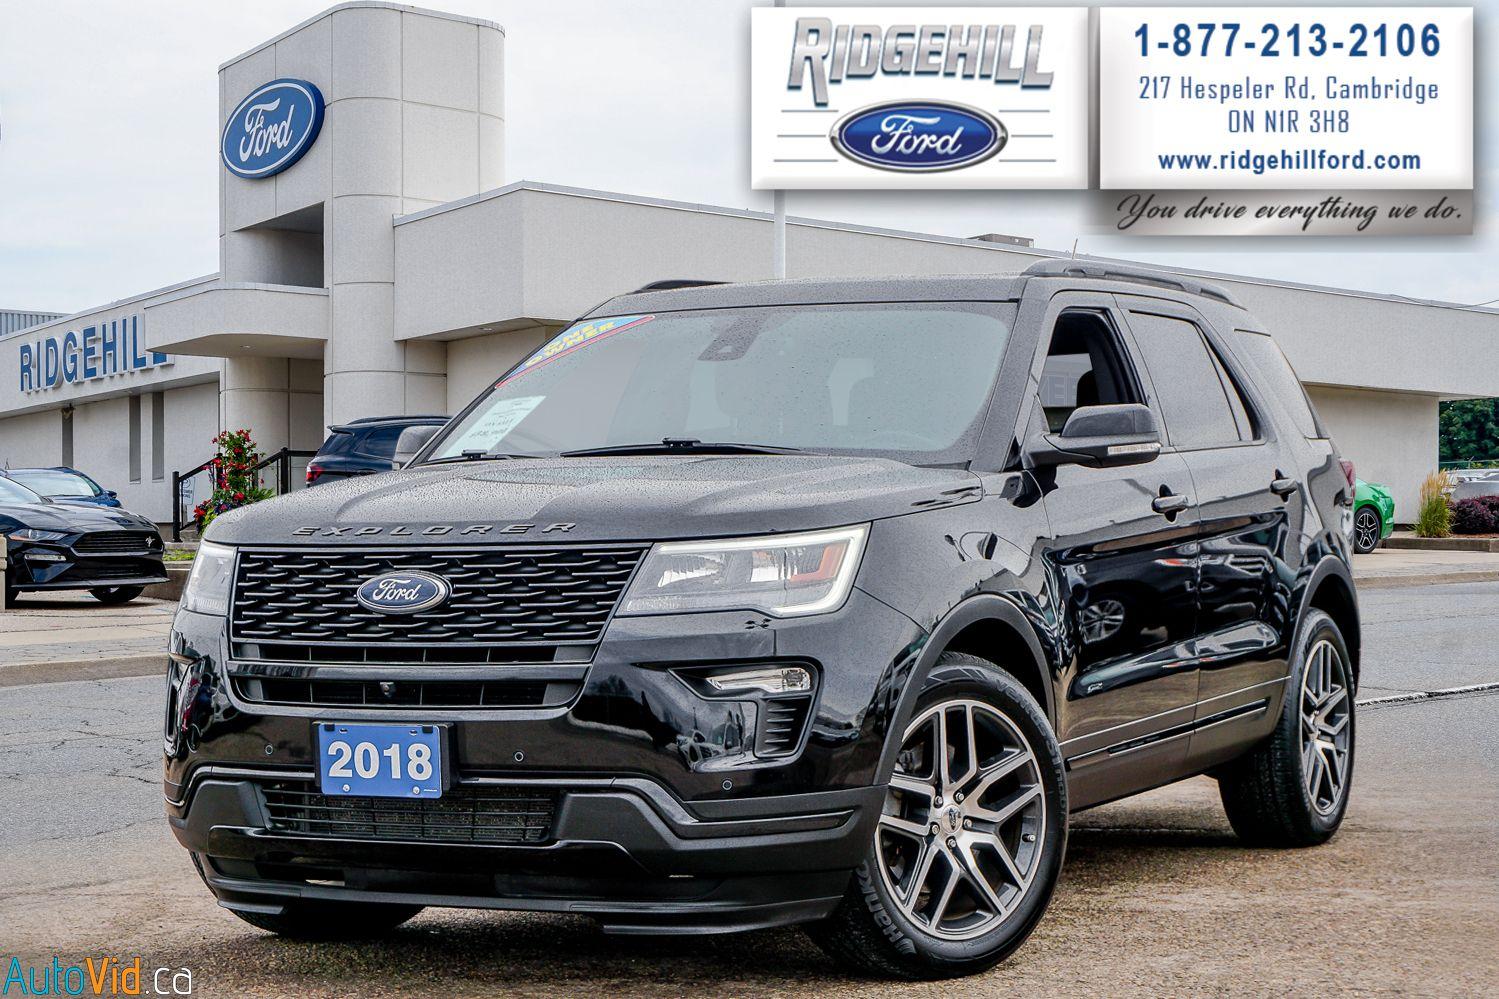 2018 Ford Explorer Image